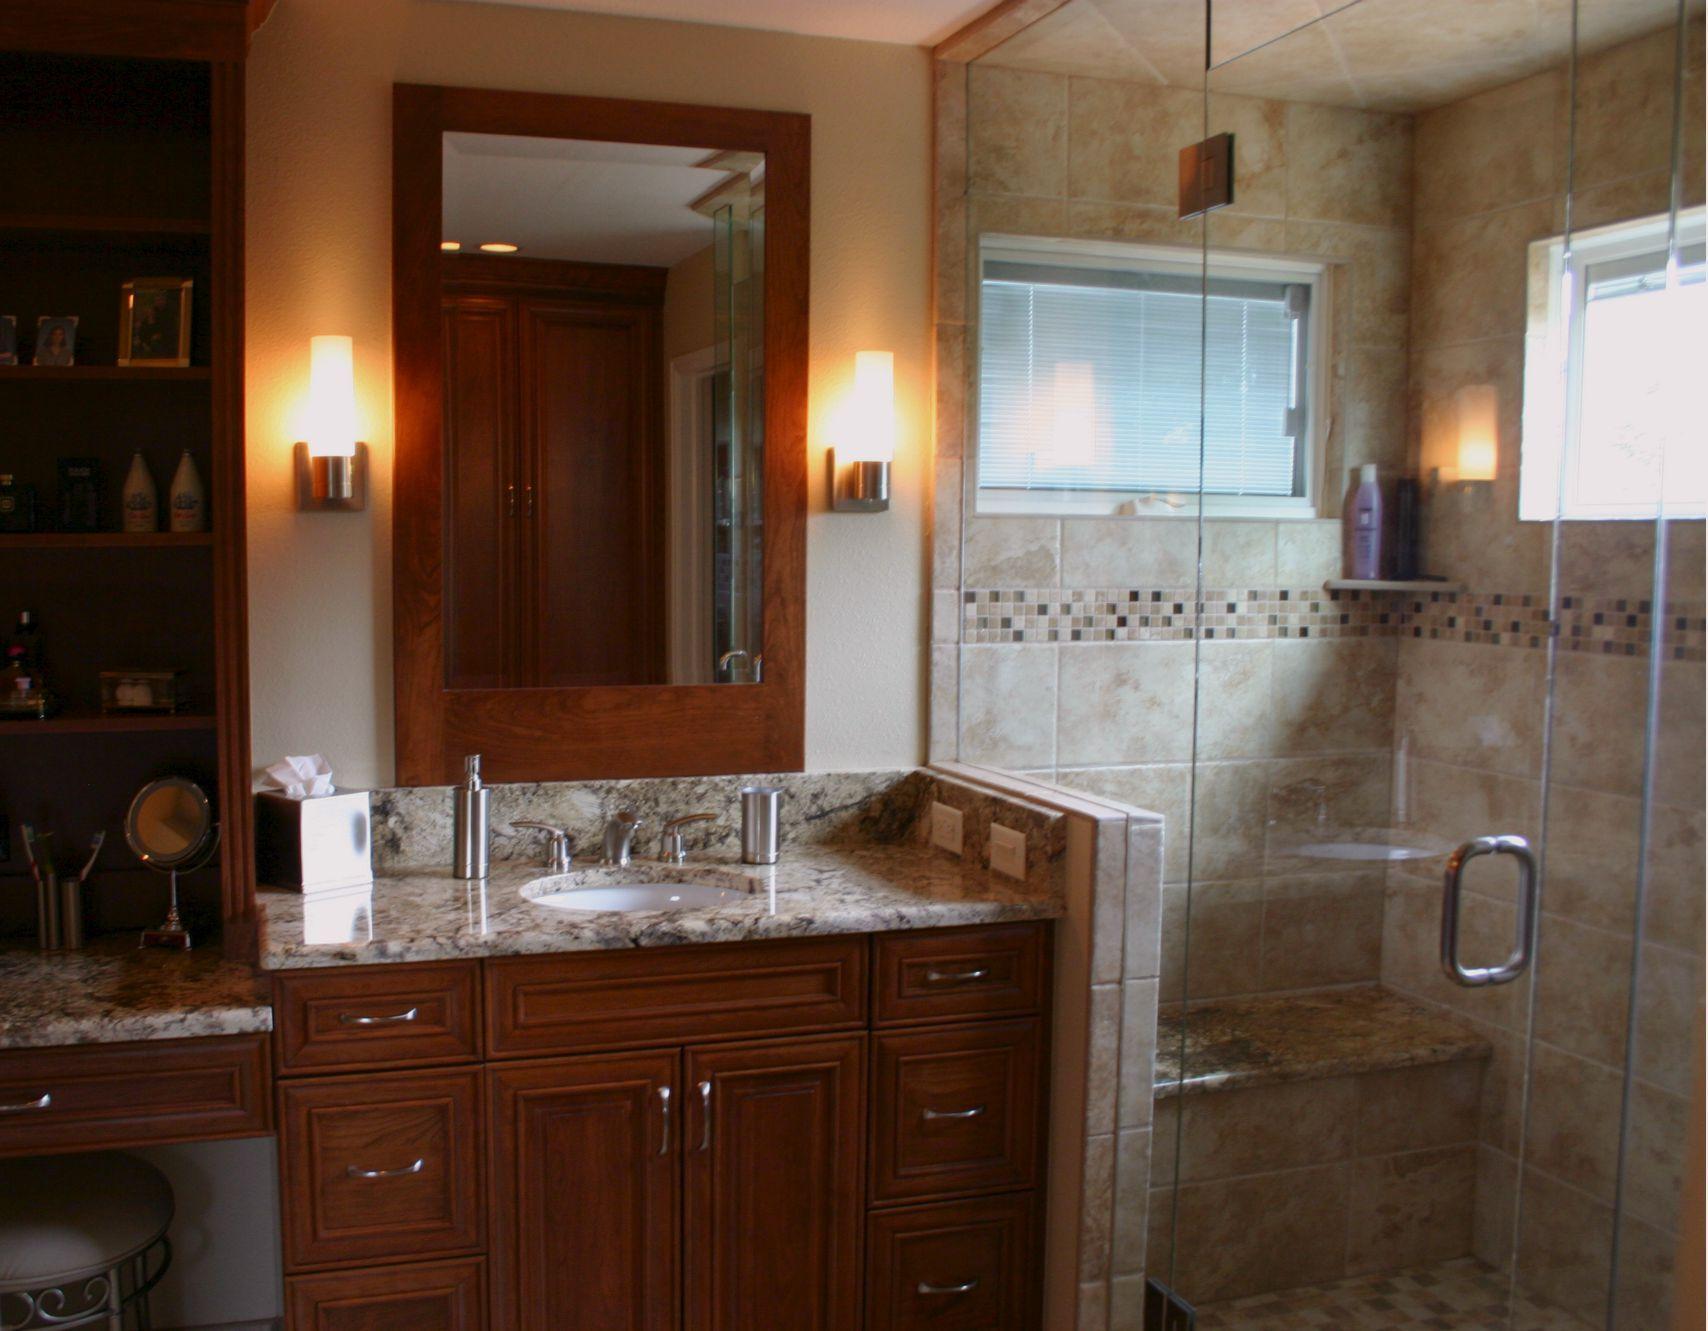 Bkc kitchen and bath master bath remodel crystal cabinet works